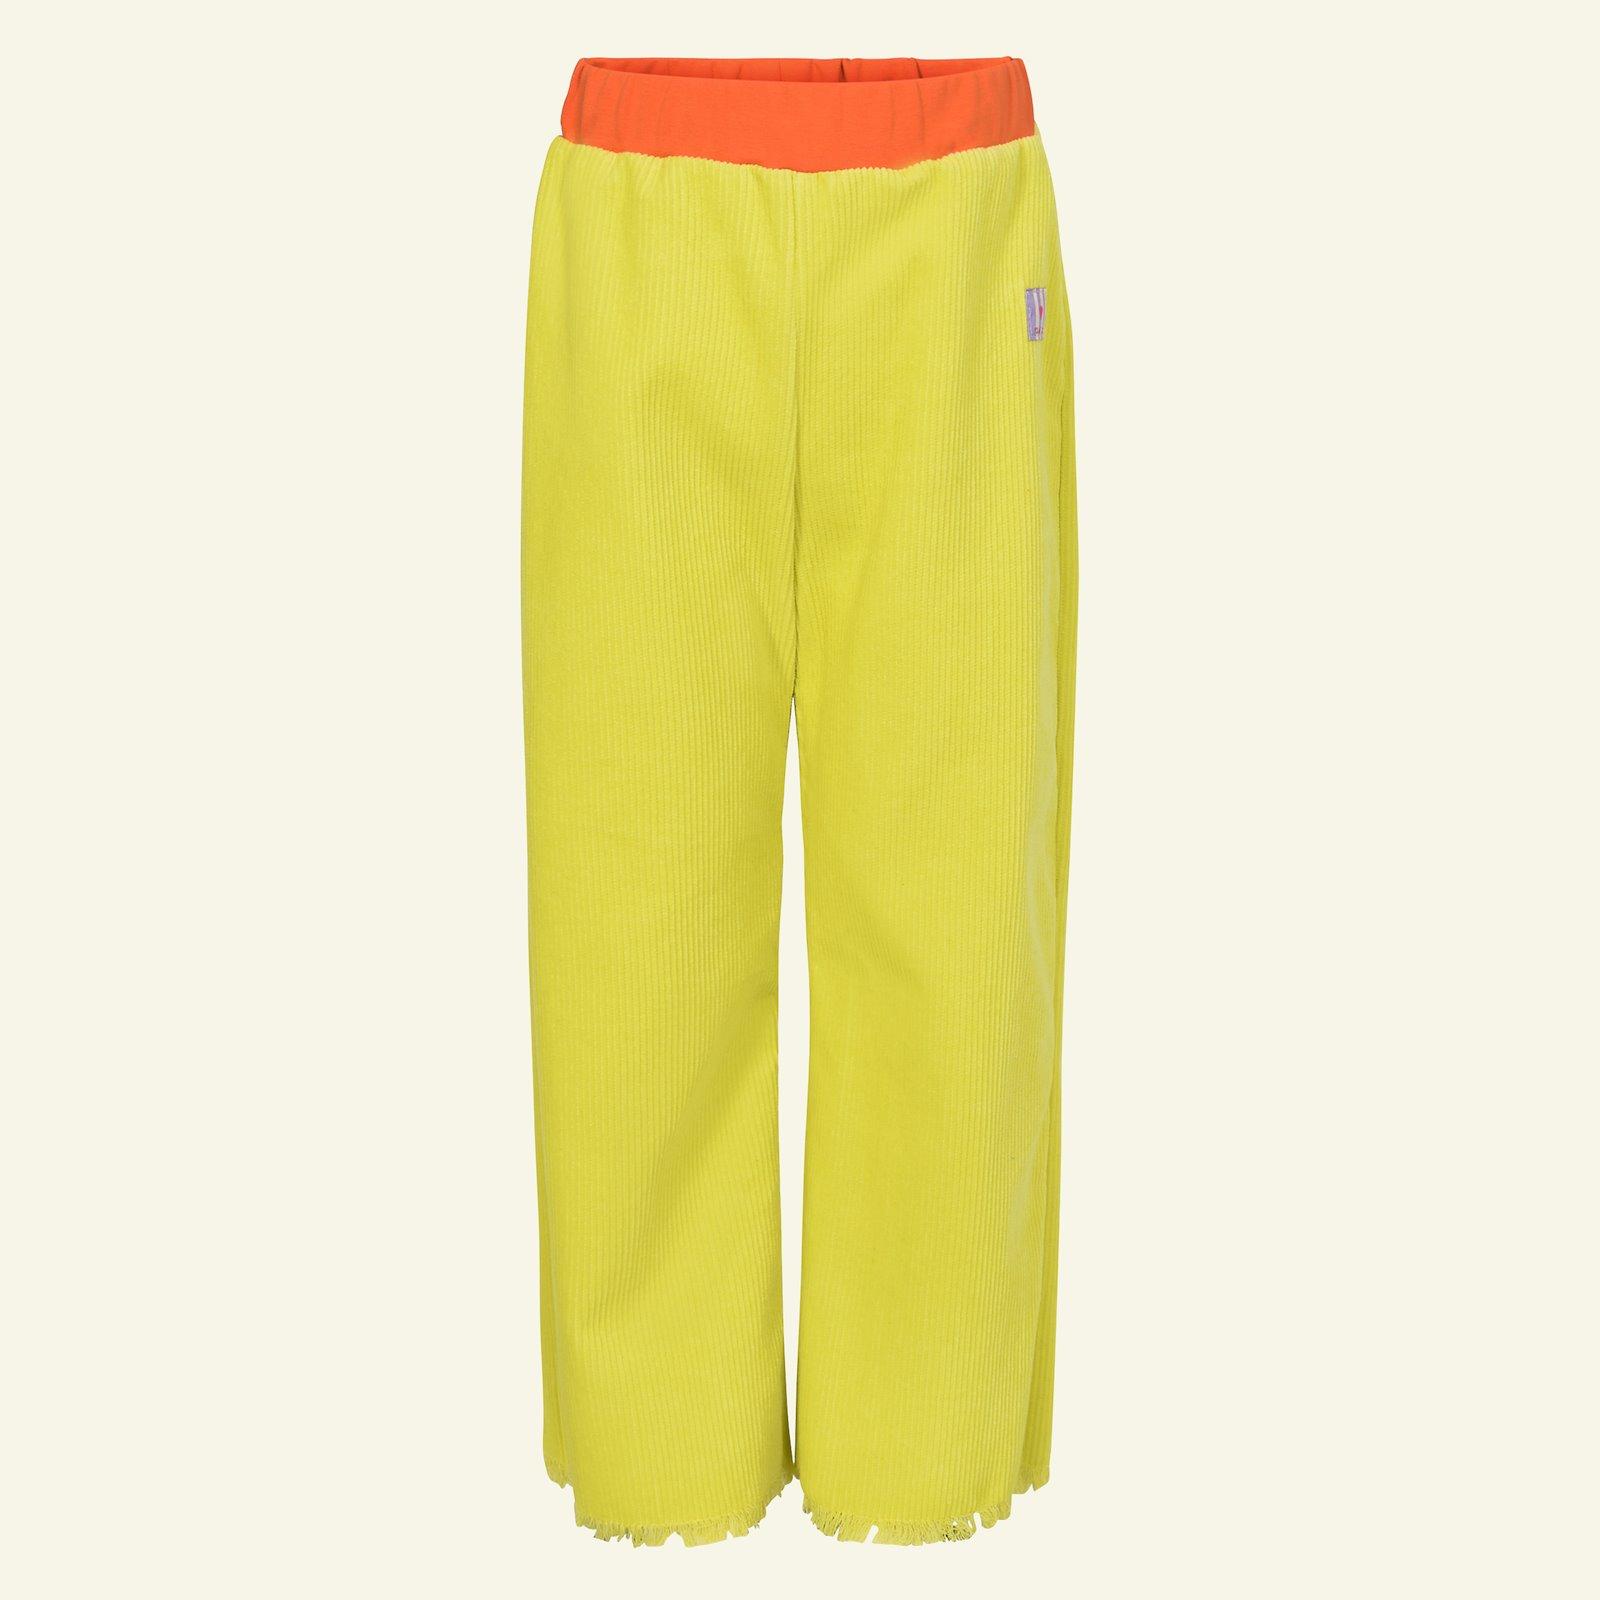 High waist and wide lege trouser, 140/10 p60034_430822_272319_26455_sskit